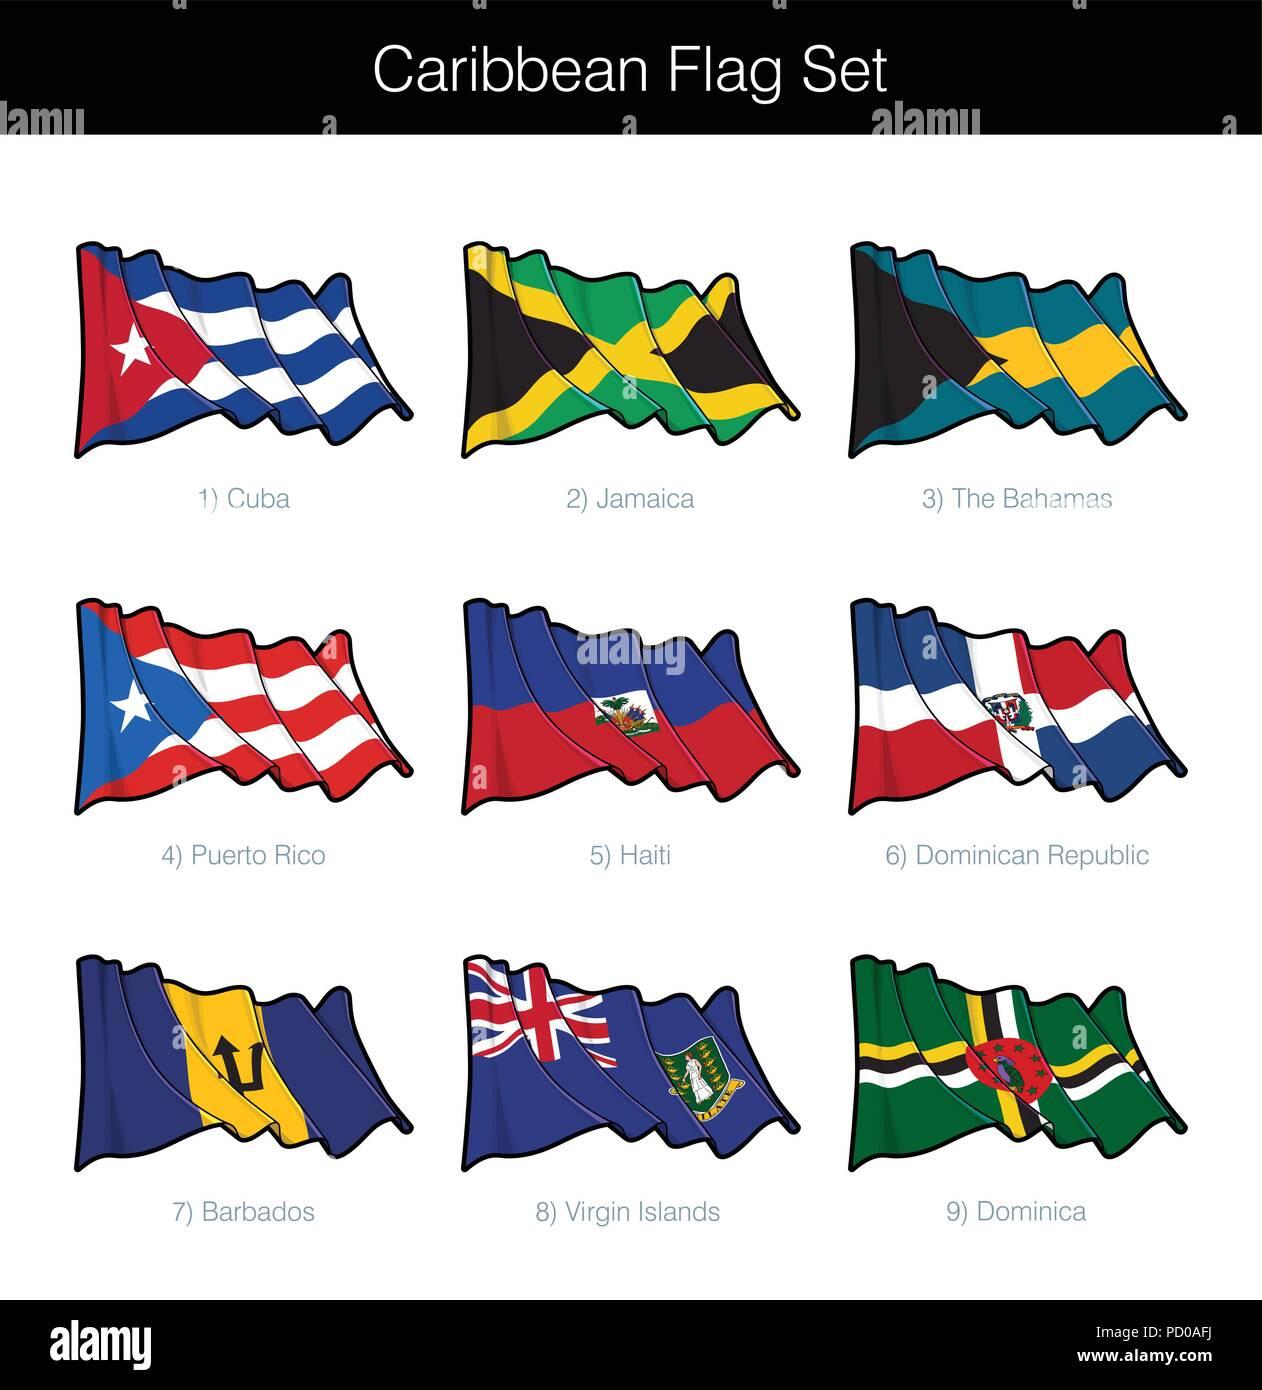 Caribbean Waving Flag Set. The set includes the flags of Cuba, Jamaica, The Bahamas, Puerto Rico, Haiti, Dominican Republic, Barbados, British Virgin  - Stock Vector